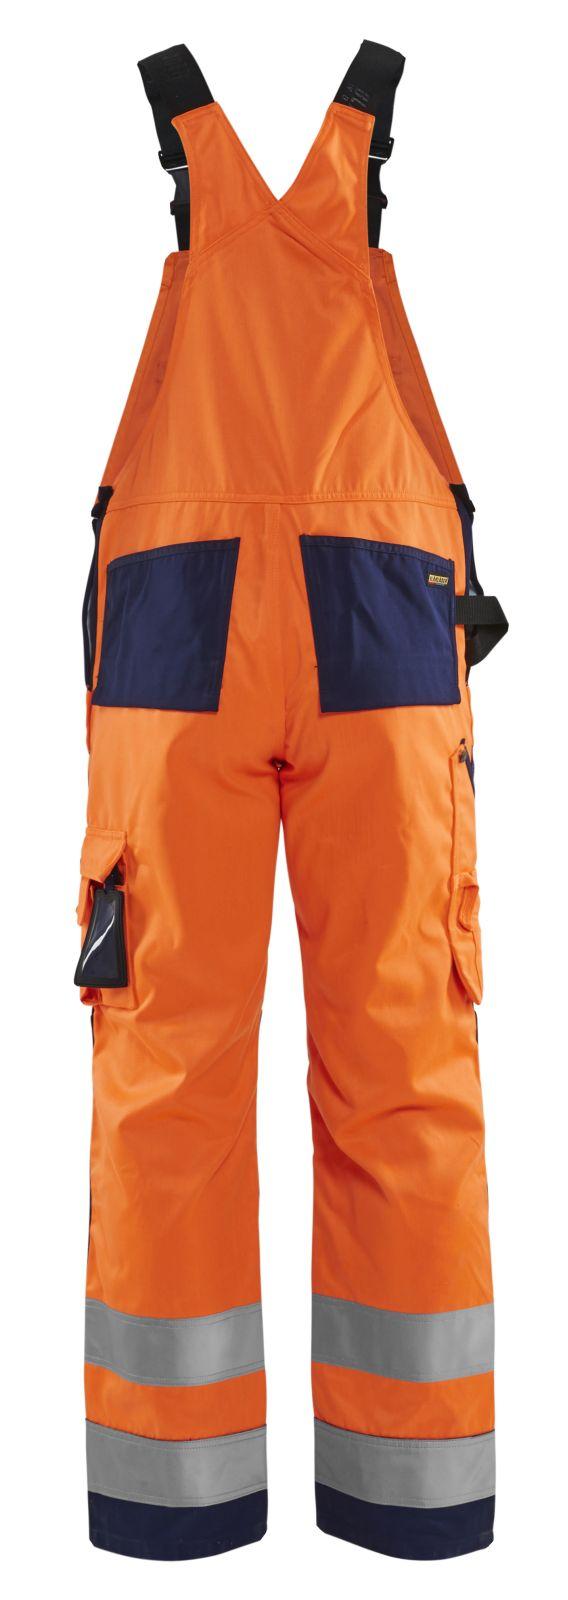 Blaklader Amerikaanse overalls 26601804 High Vis oranje-marineblauw(5389)